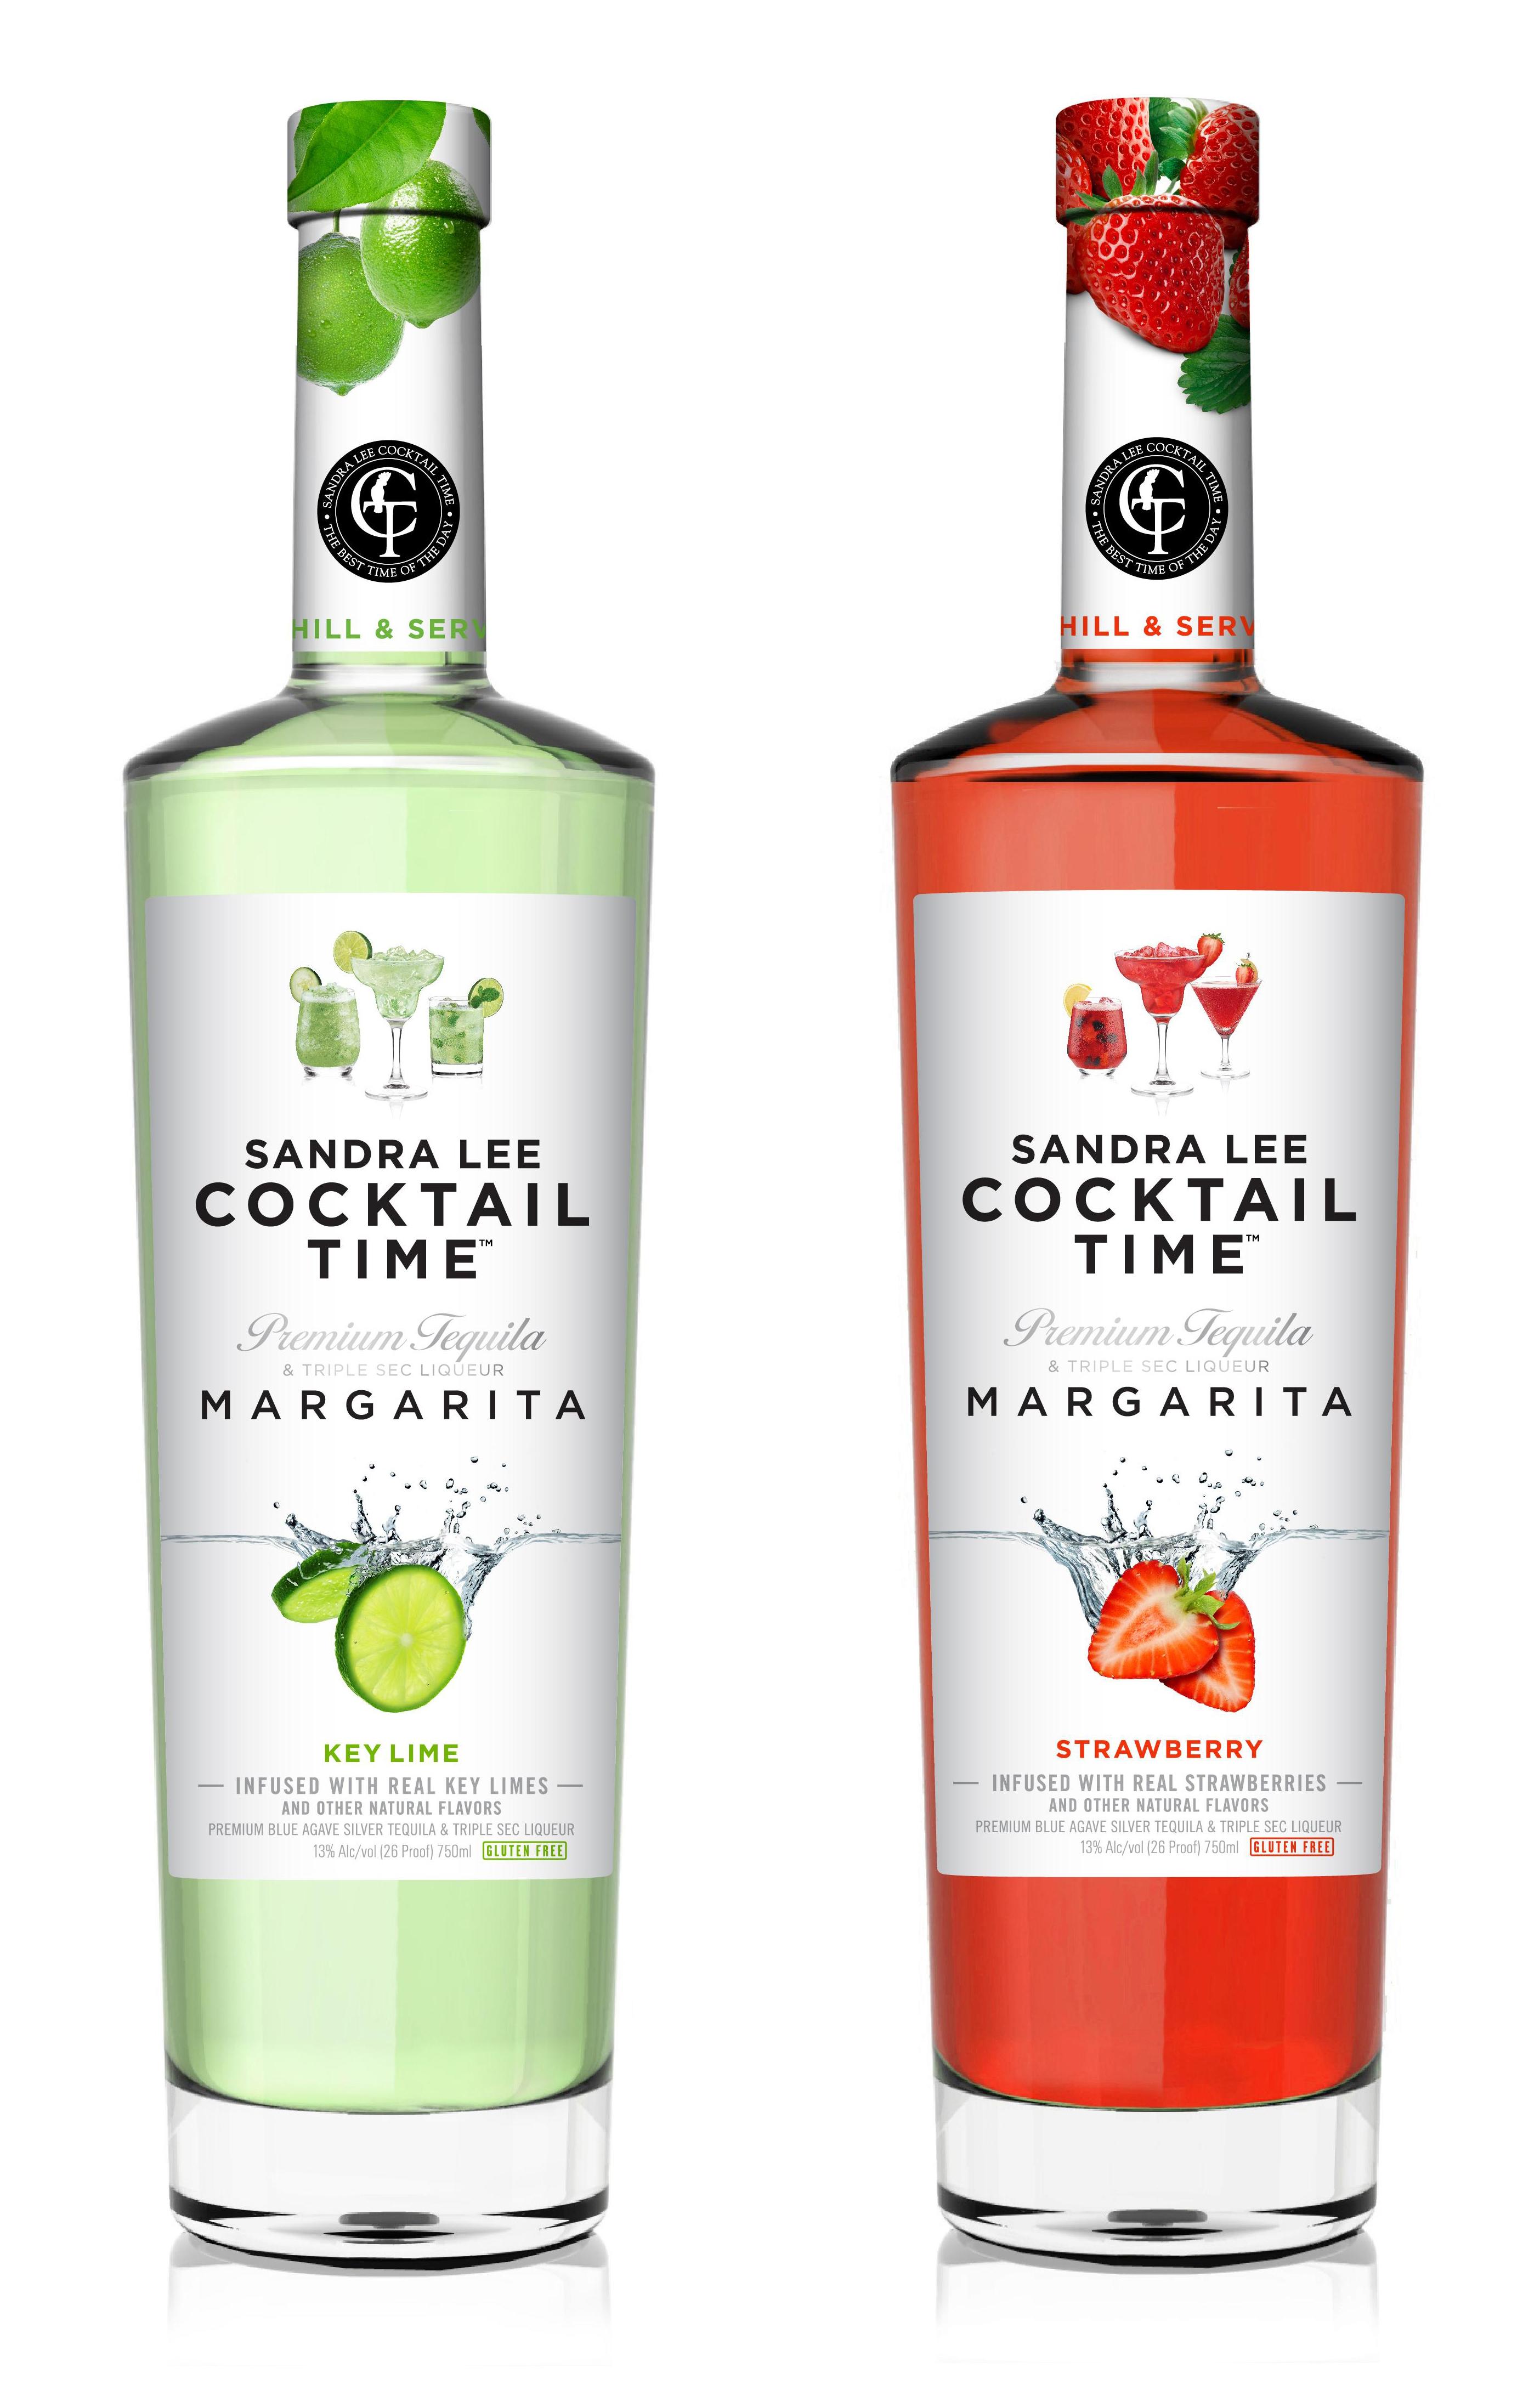 Sandra Lee Cocktail Time Margarita Strawberry